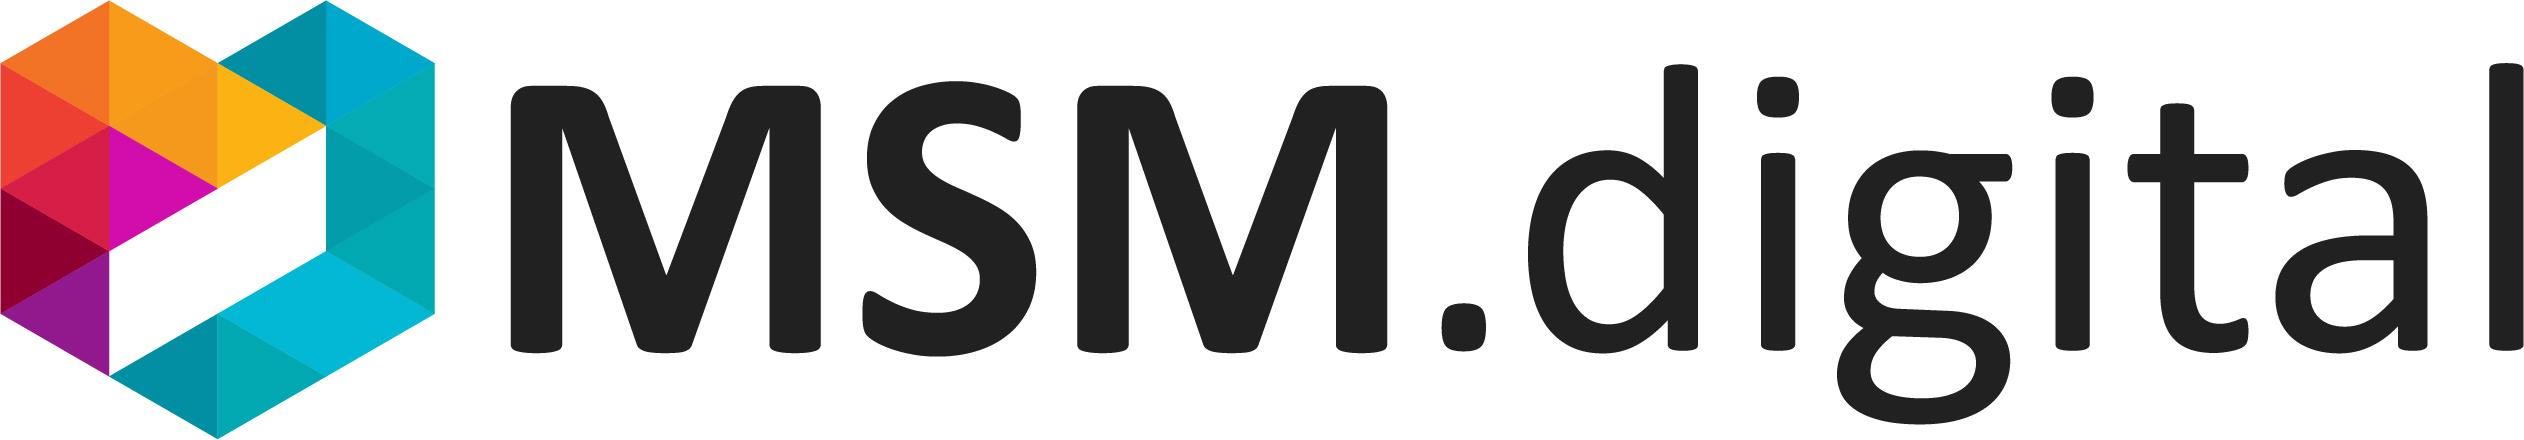 MSM_Group